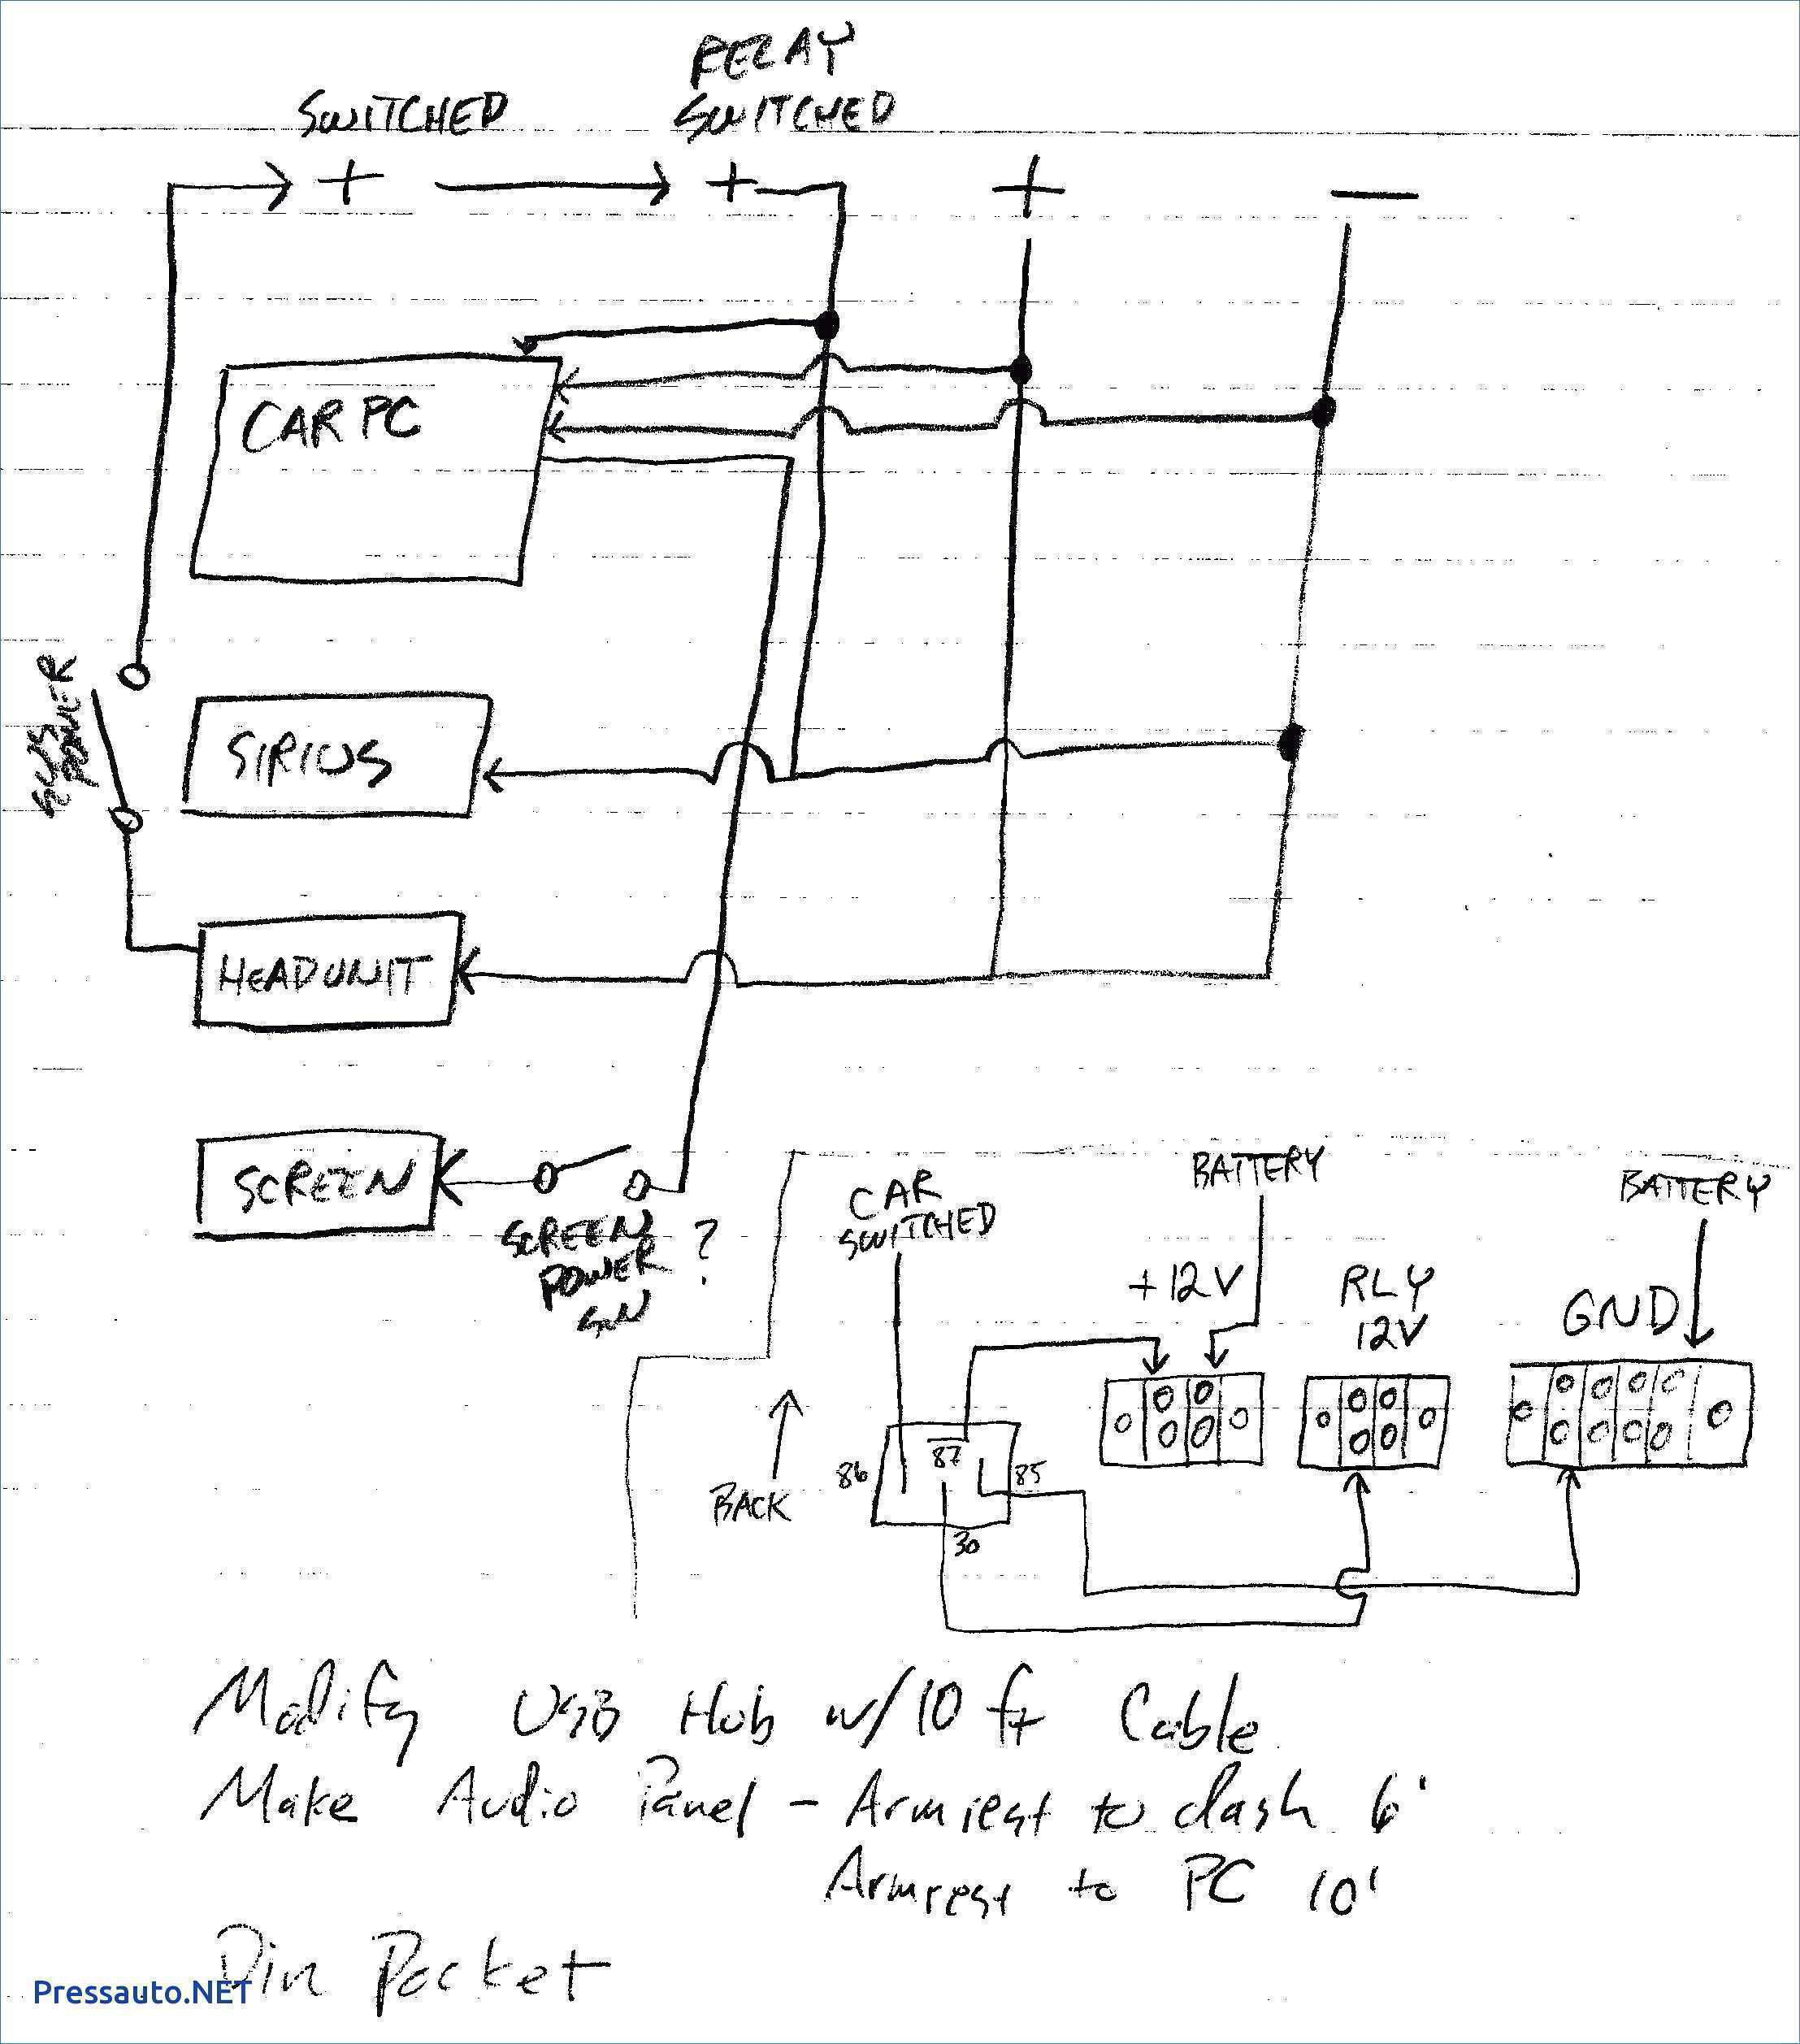 Meyer Plow Controller Wiring Diagram | Manual E-Books - Meyer E47 Wiring Diagram